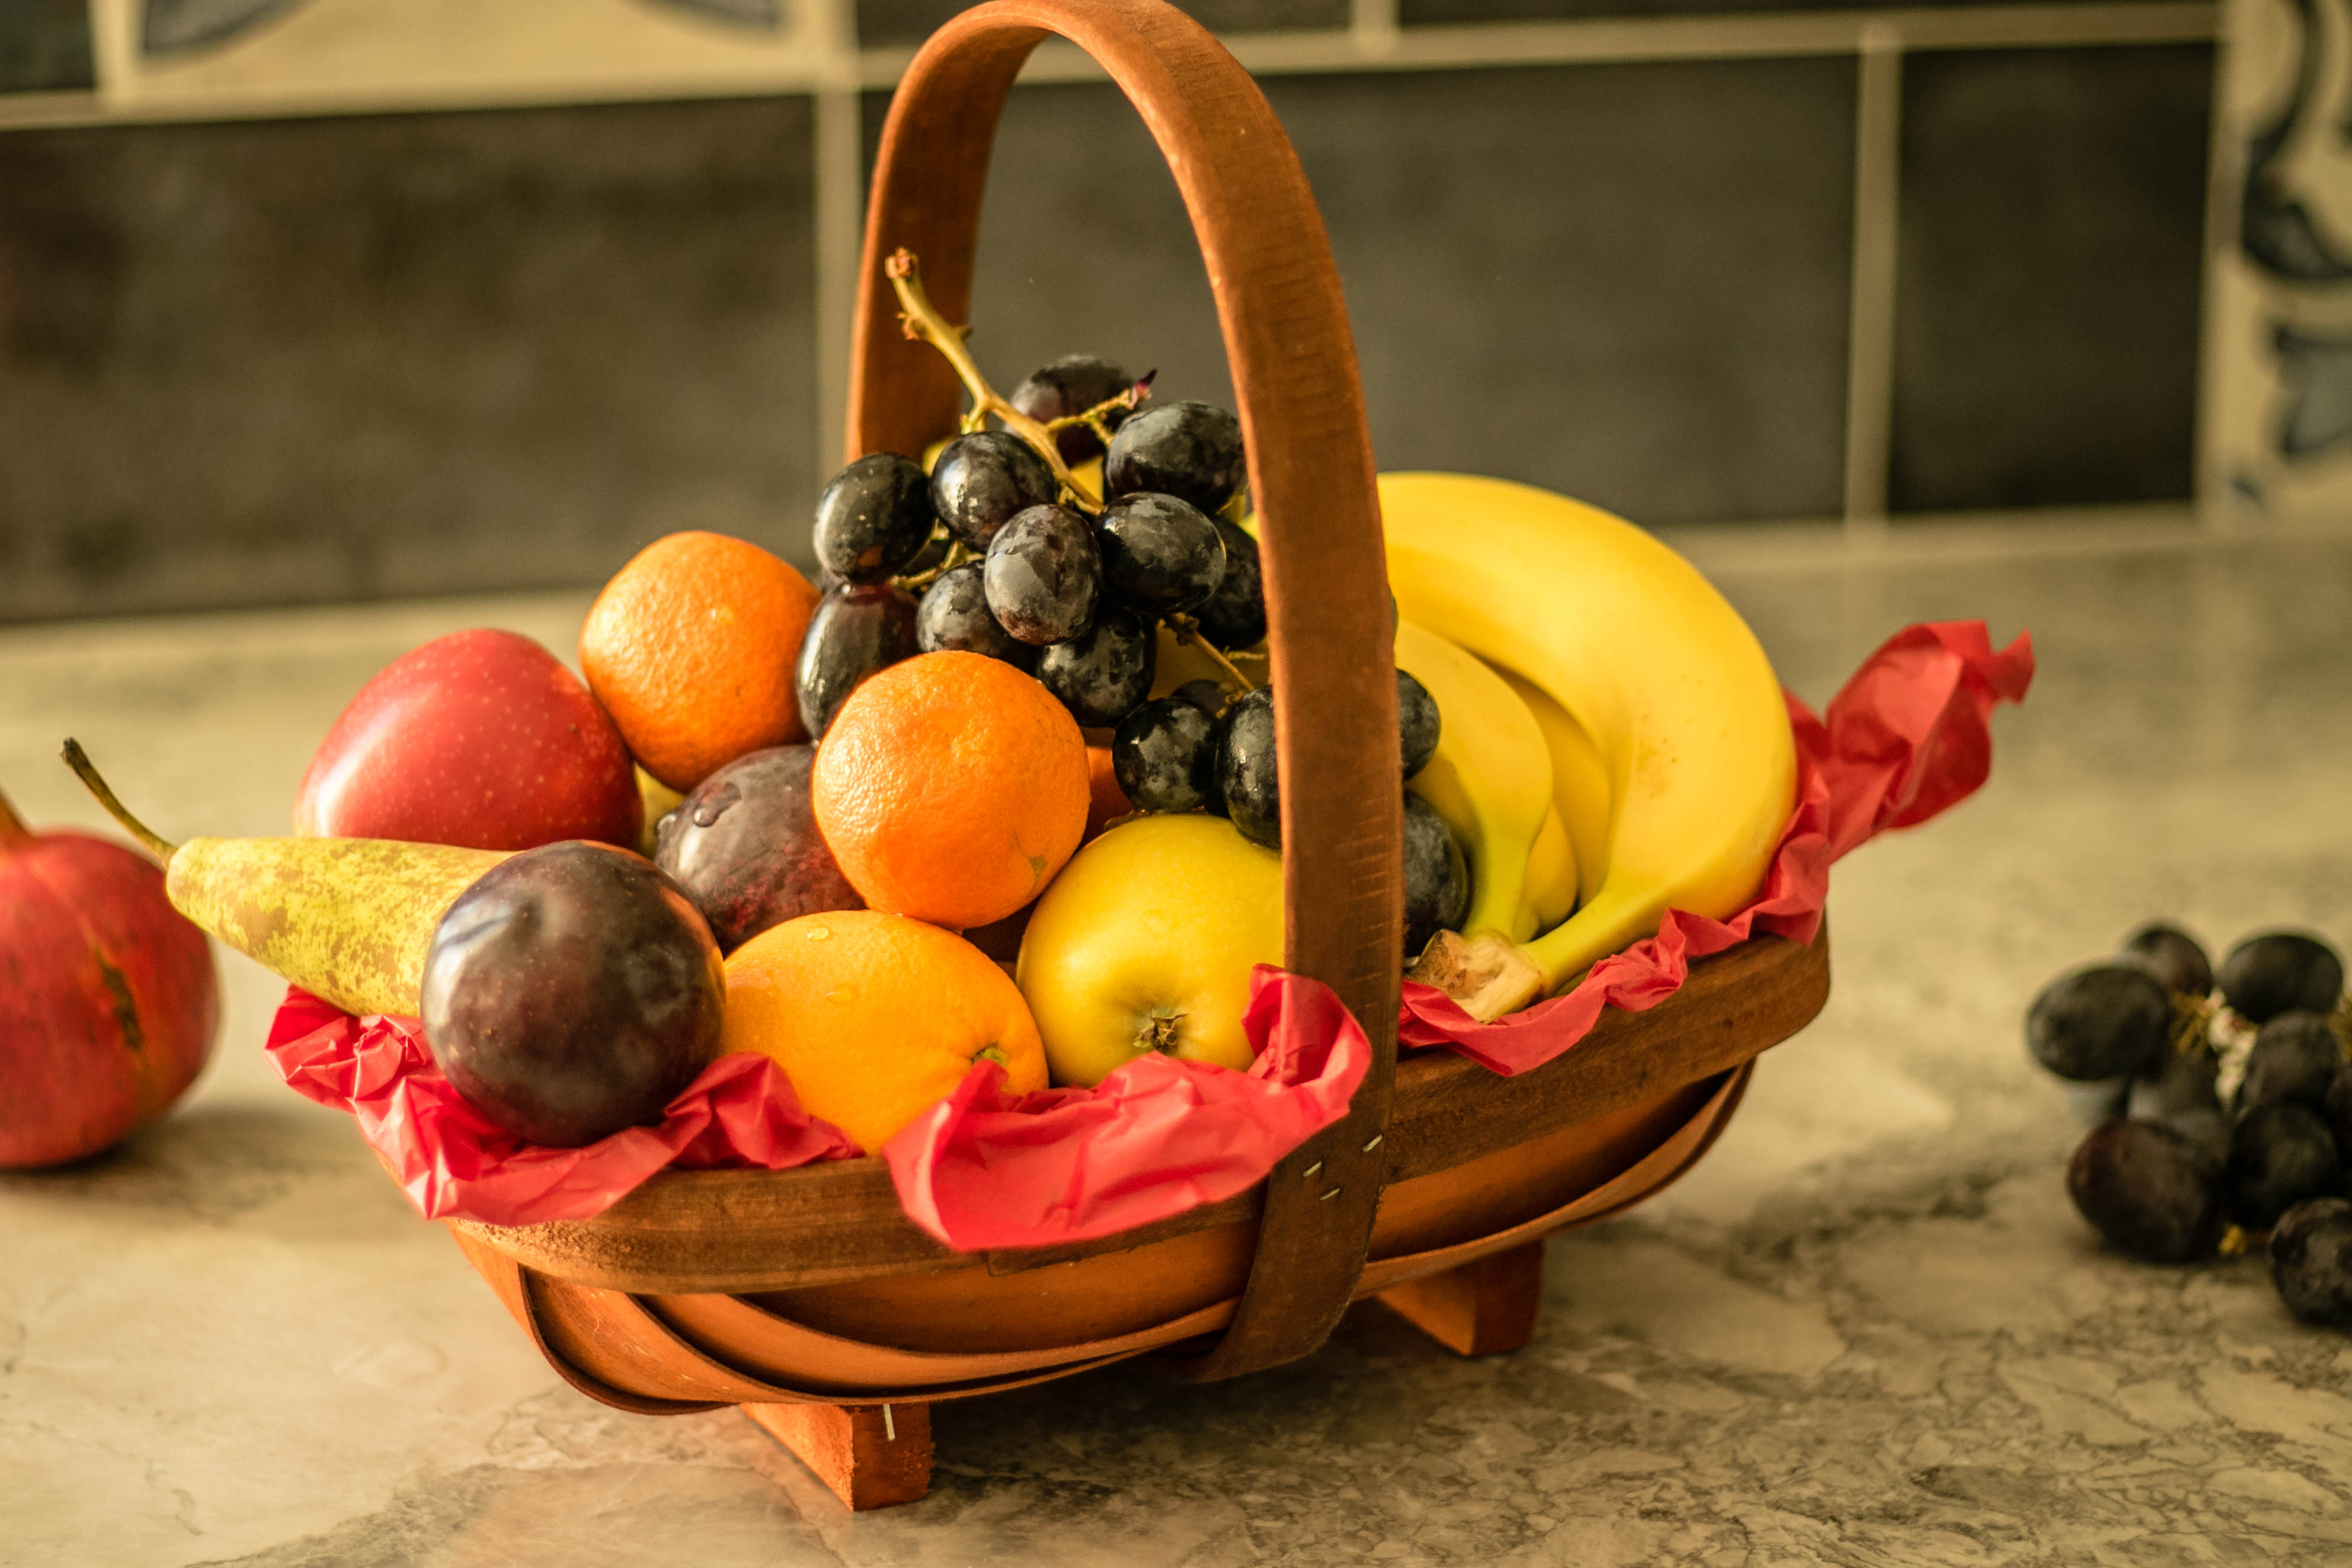 Gifts, flowers, fruit basket